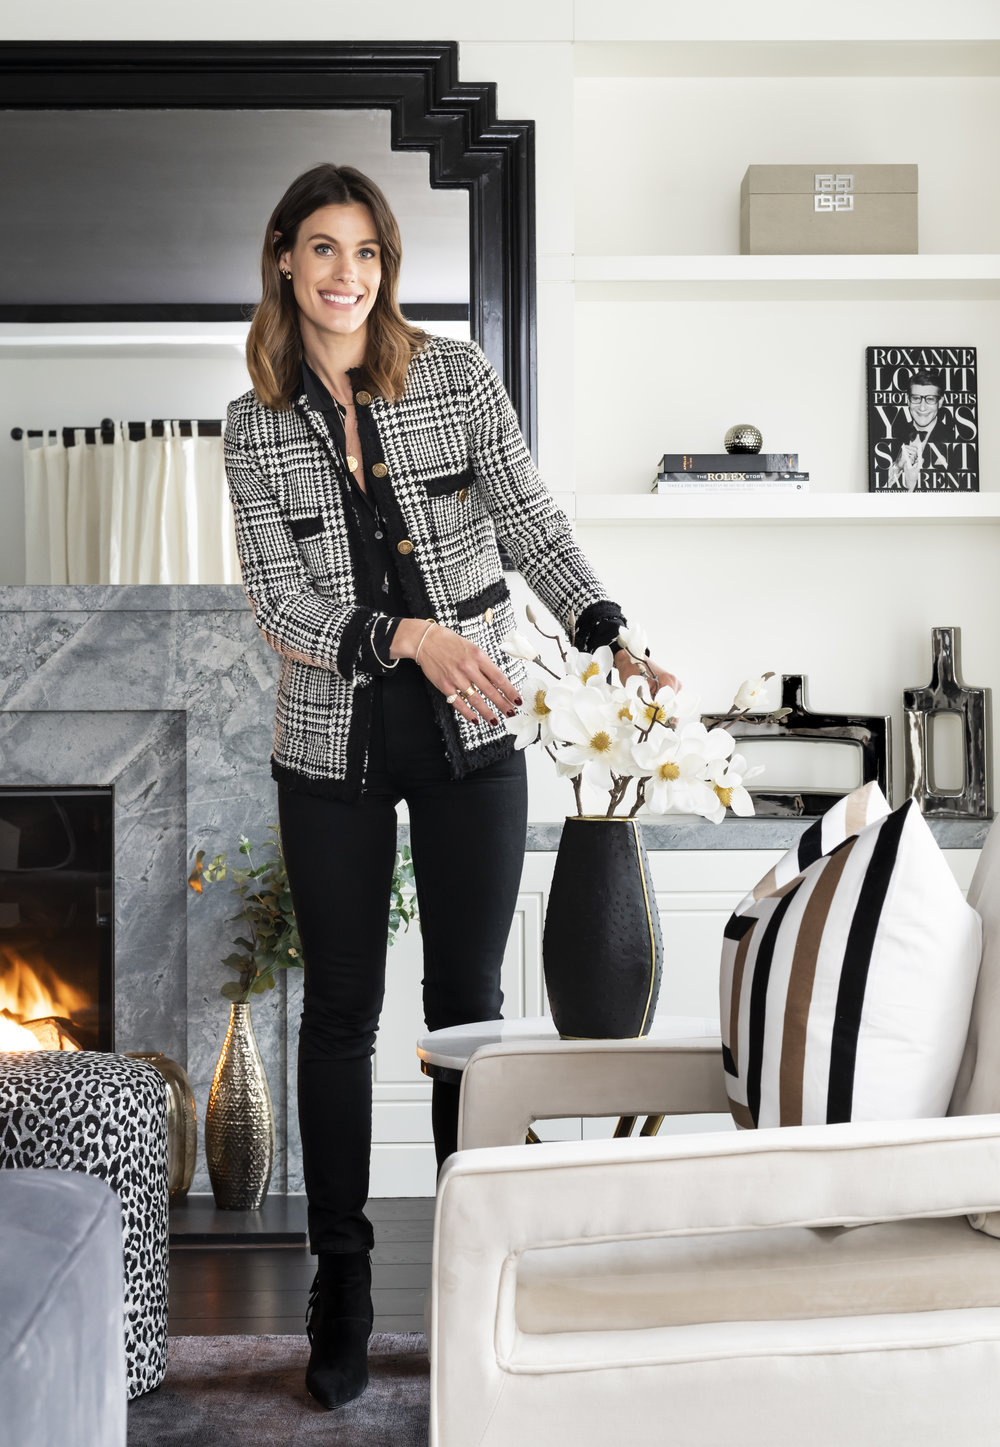 Michele Atijas  Yoha May Interiors FurniturePackage